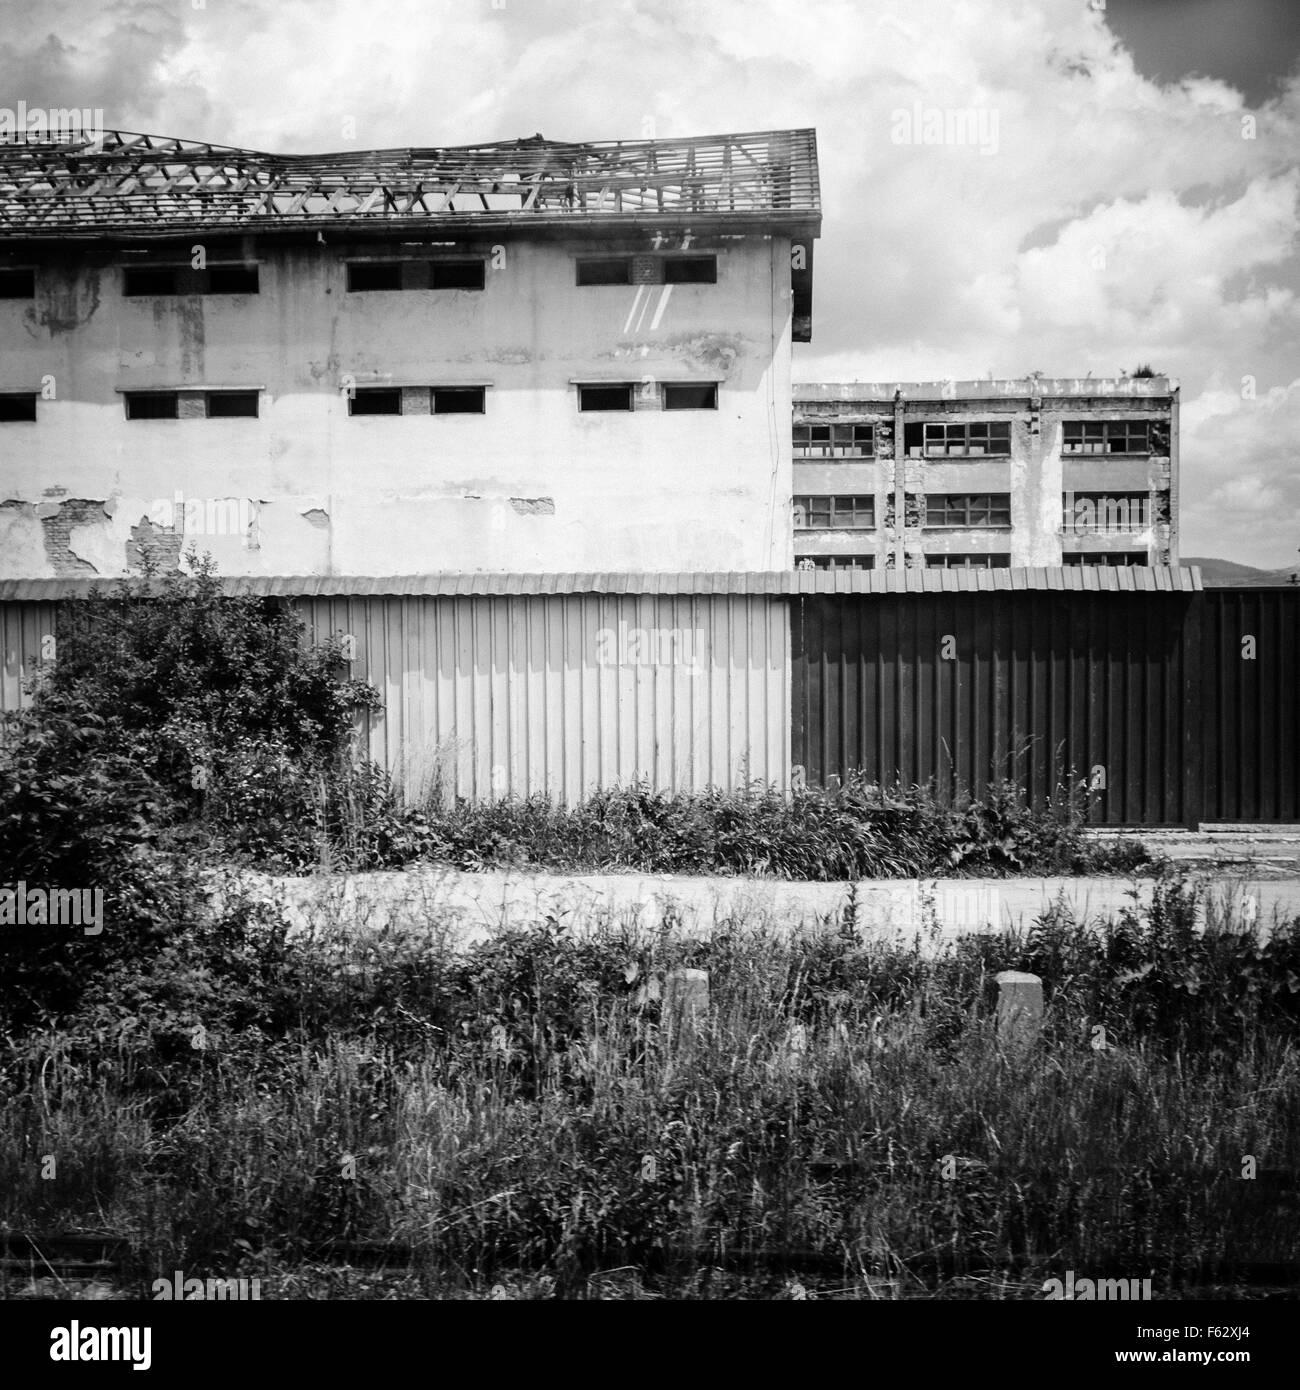 Post-industrial black and white landscape. Industrial buildings in nature. Miercurea Ciuc, Harghita County, Romania. - Stock Image